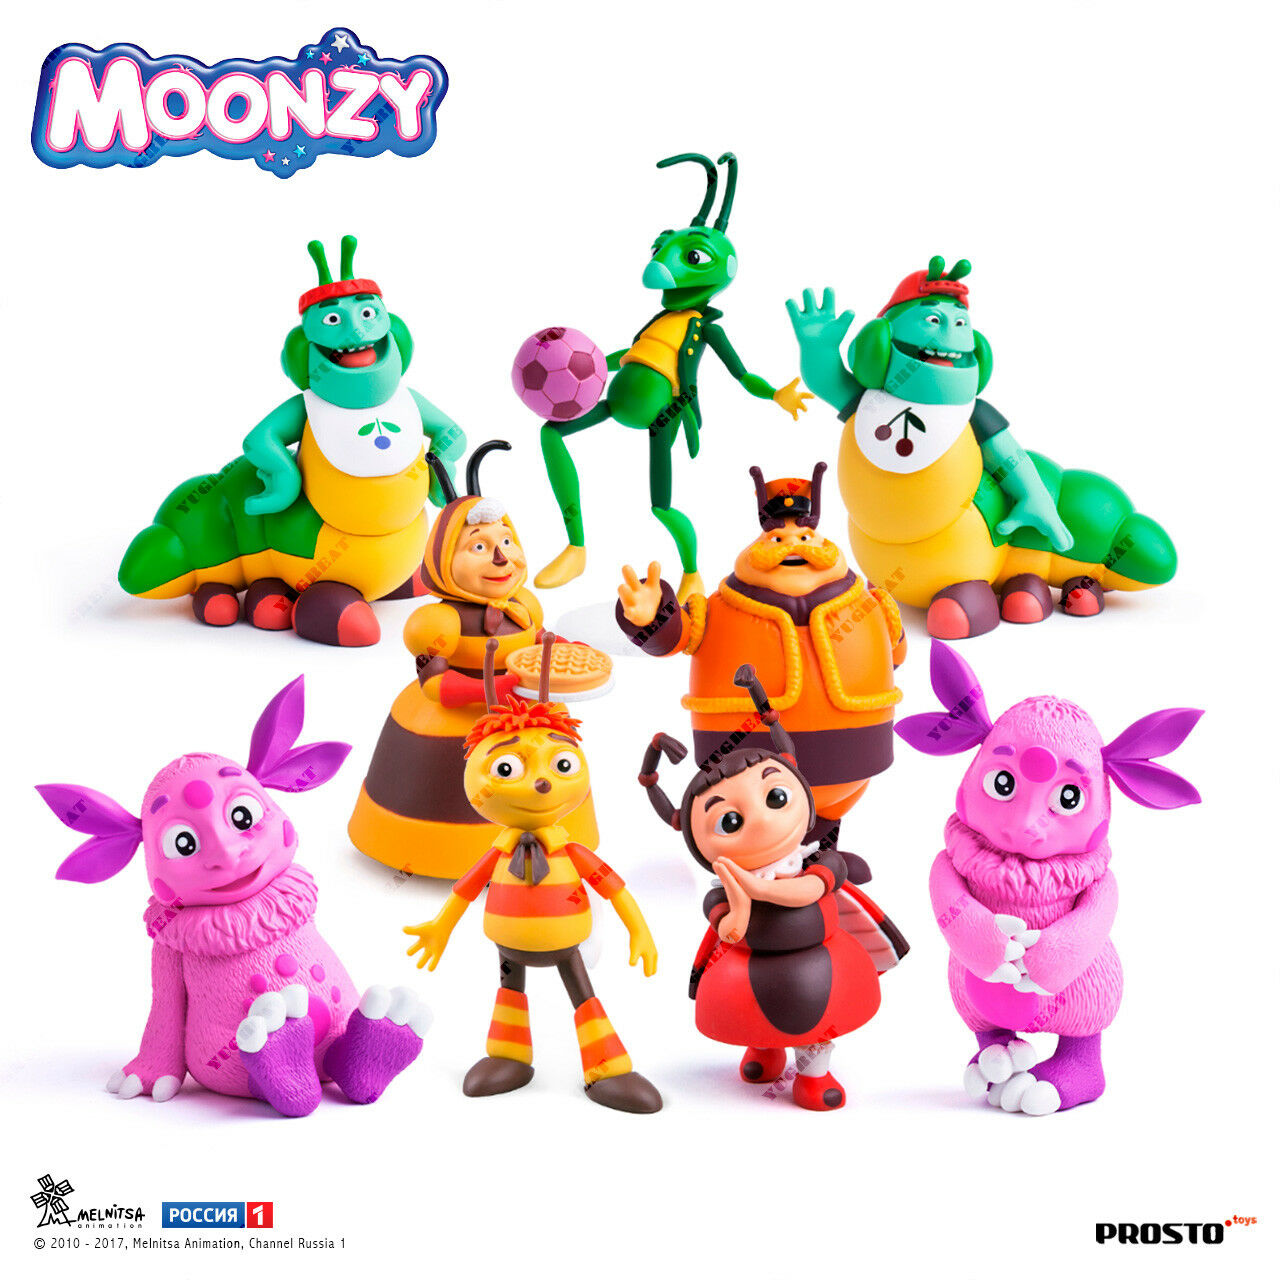 PROSTO Toys  Moonzy , Luntik, Collection Figure, Set (9 pc.), Cartoon Character